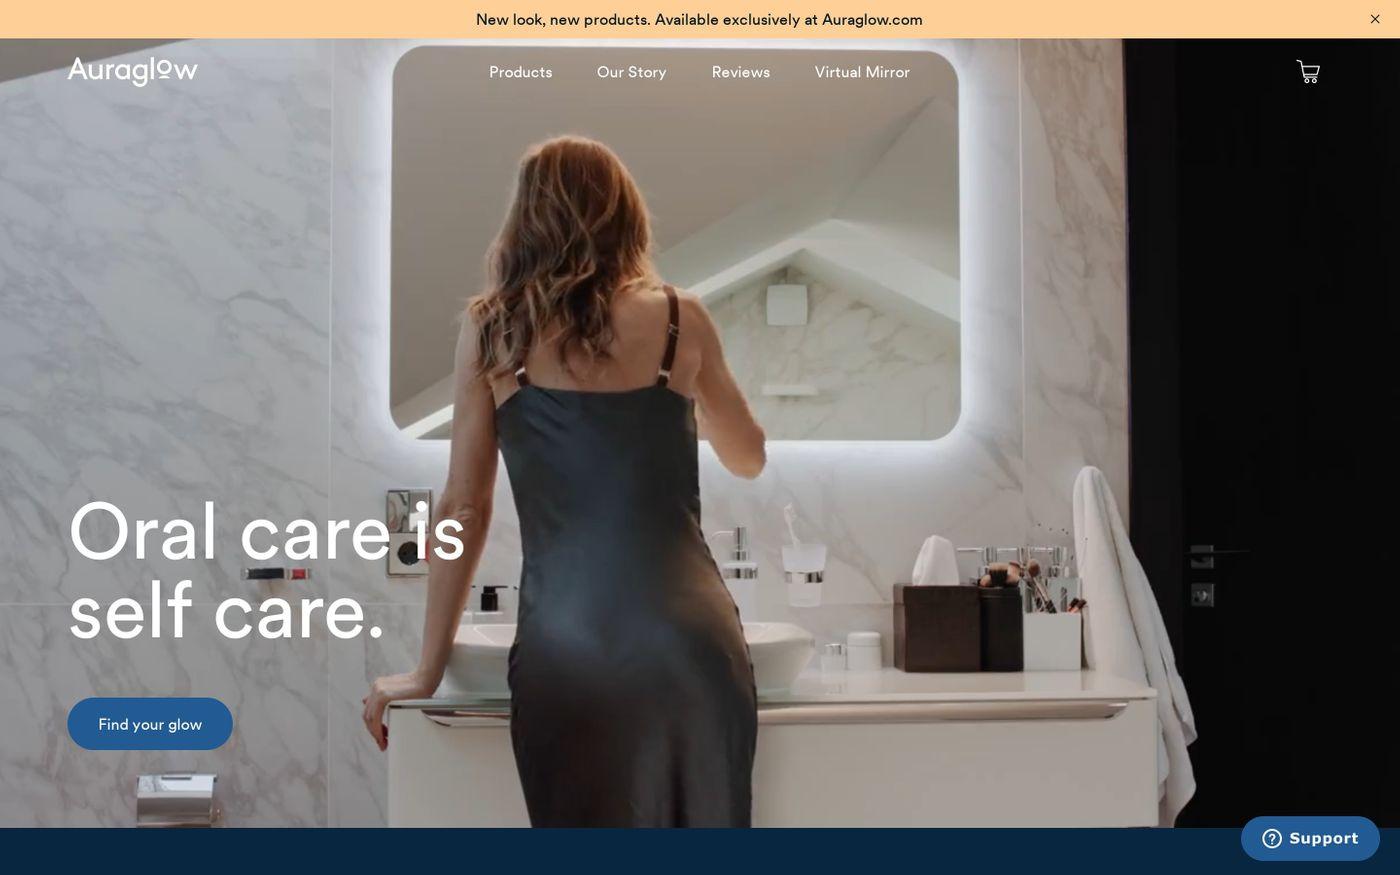 Screenshot of Auraglow website